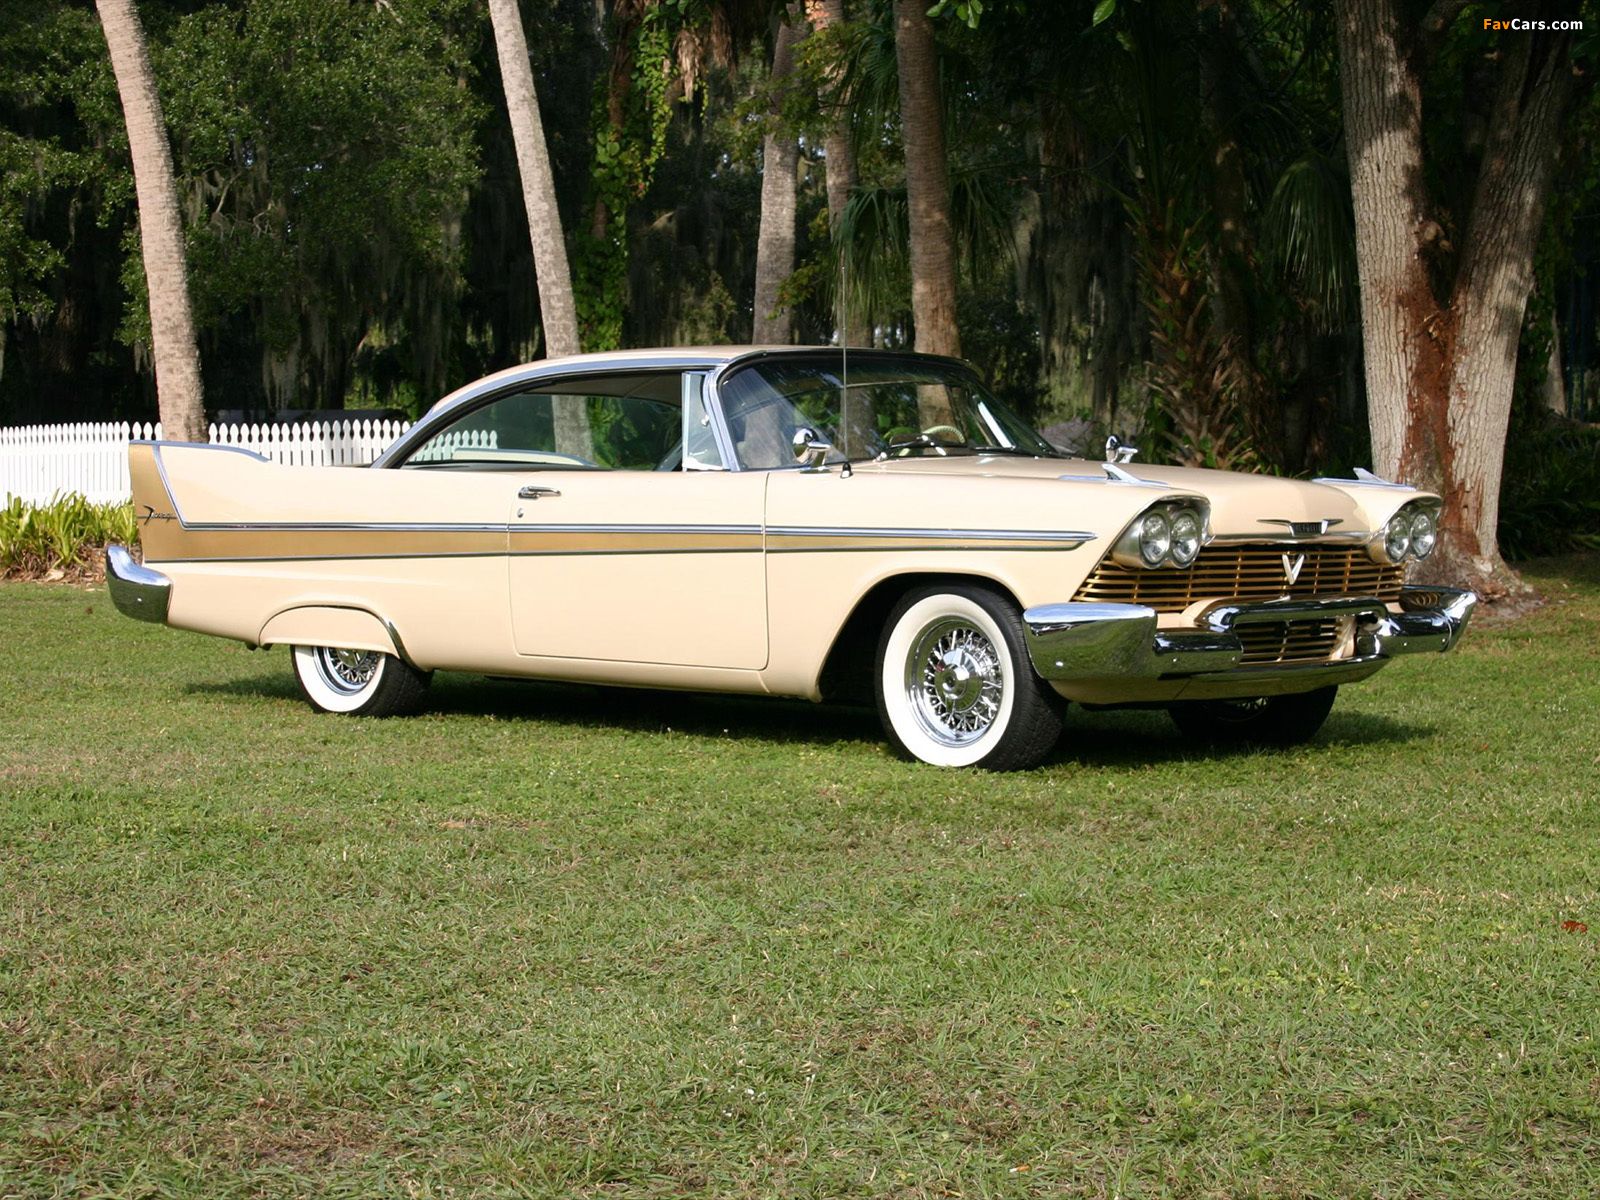 1958 Plymouth For Sale Craigslist Autos Post